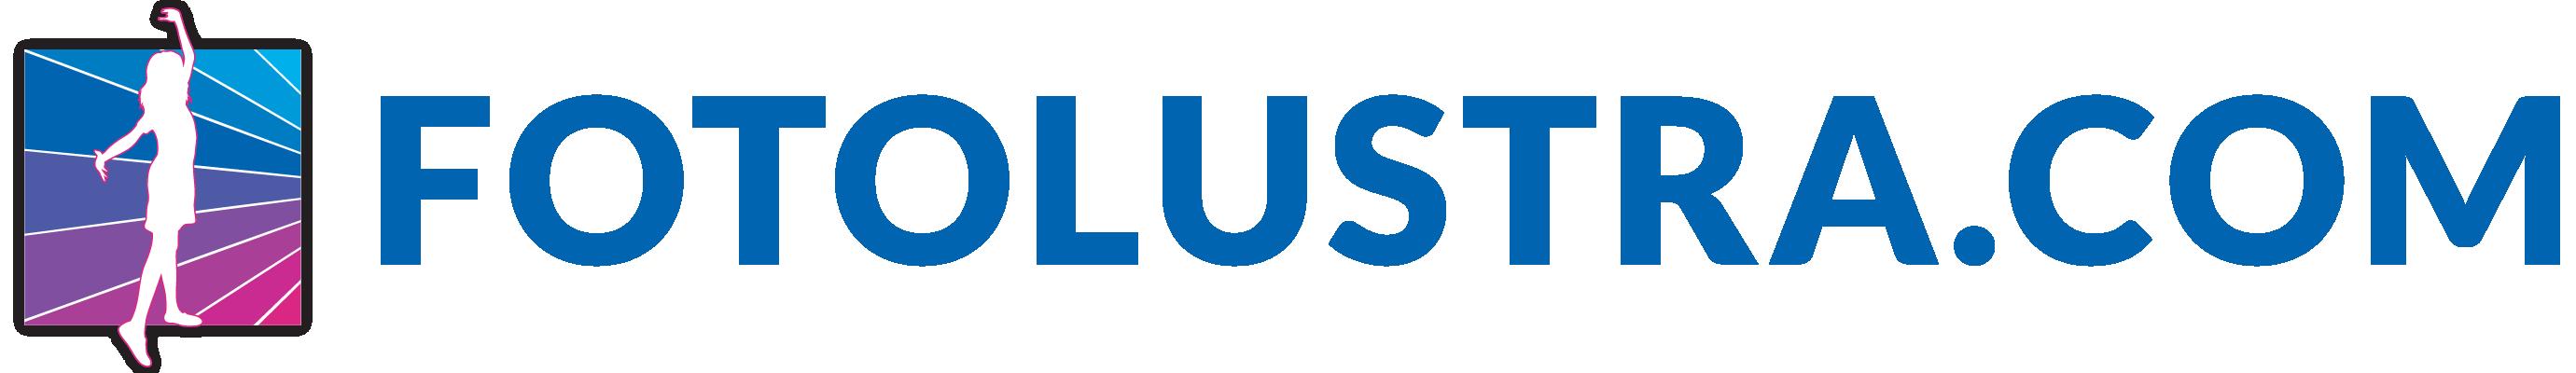 logo-02- 01-01